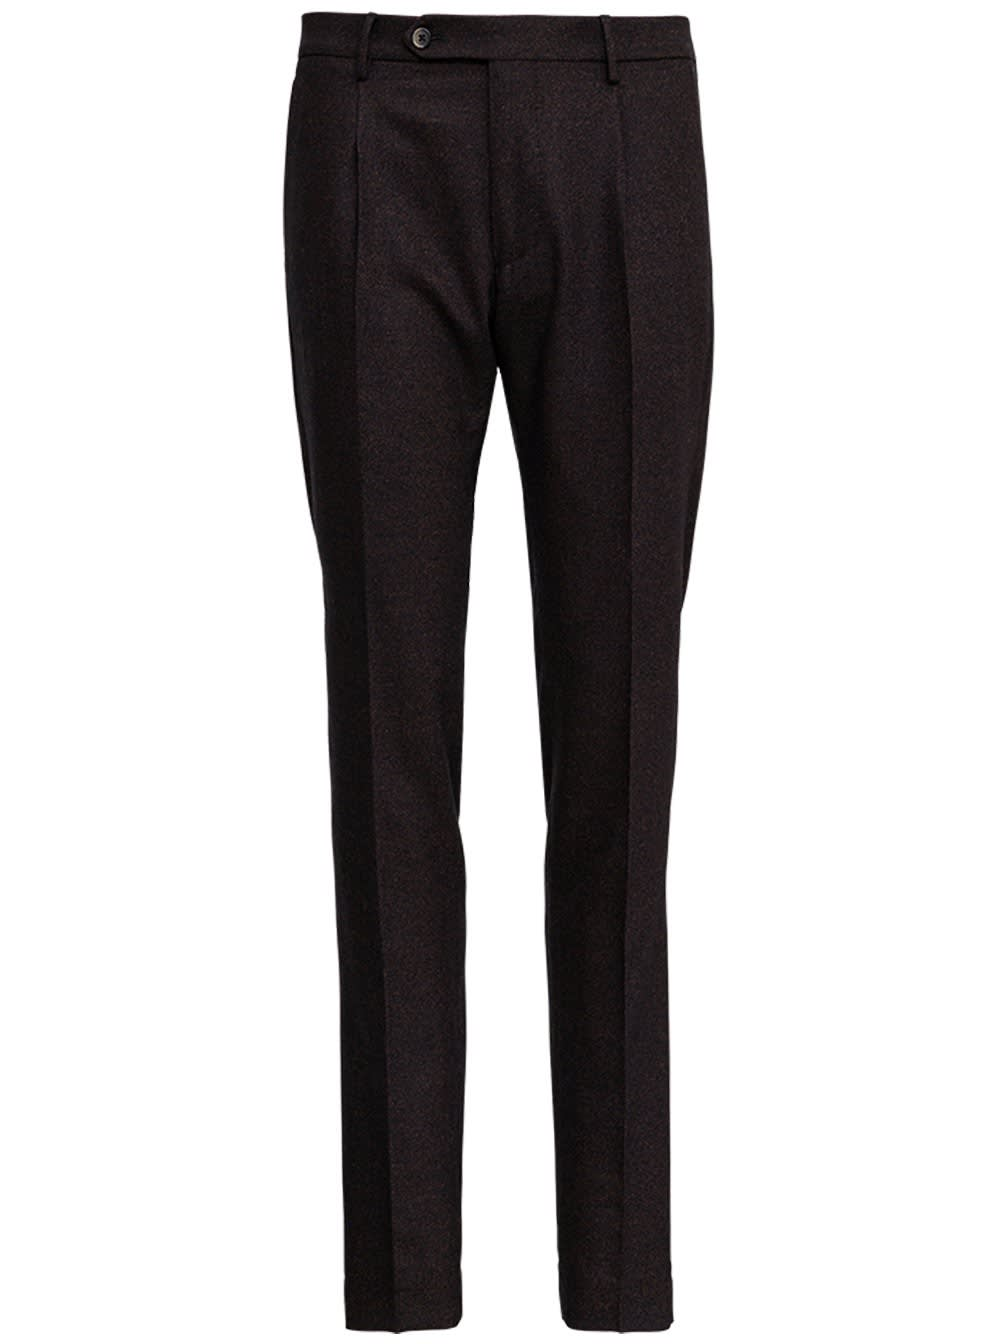 Brown Tailored Wool Pants